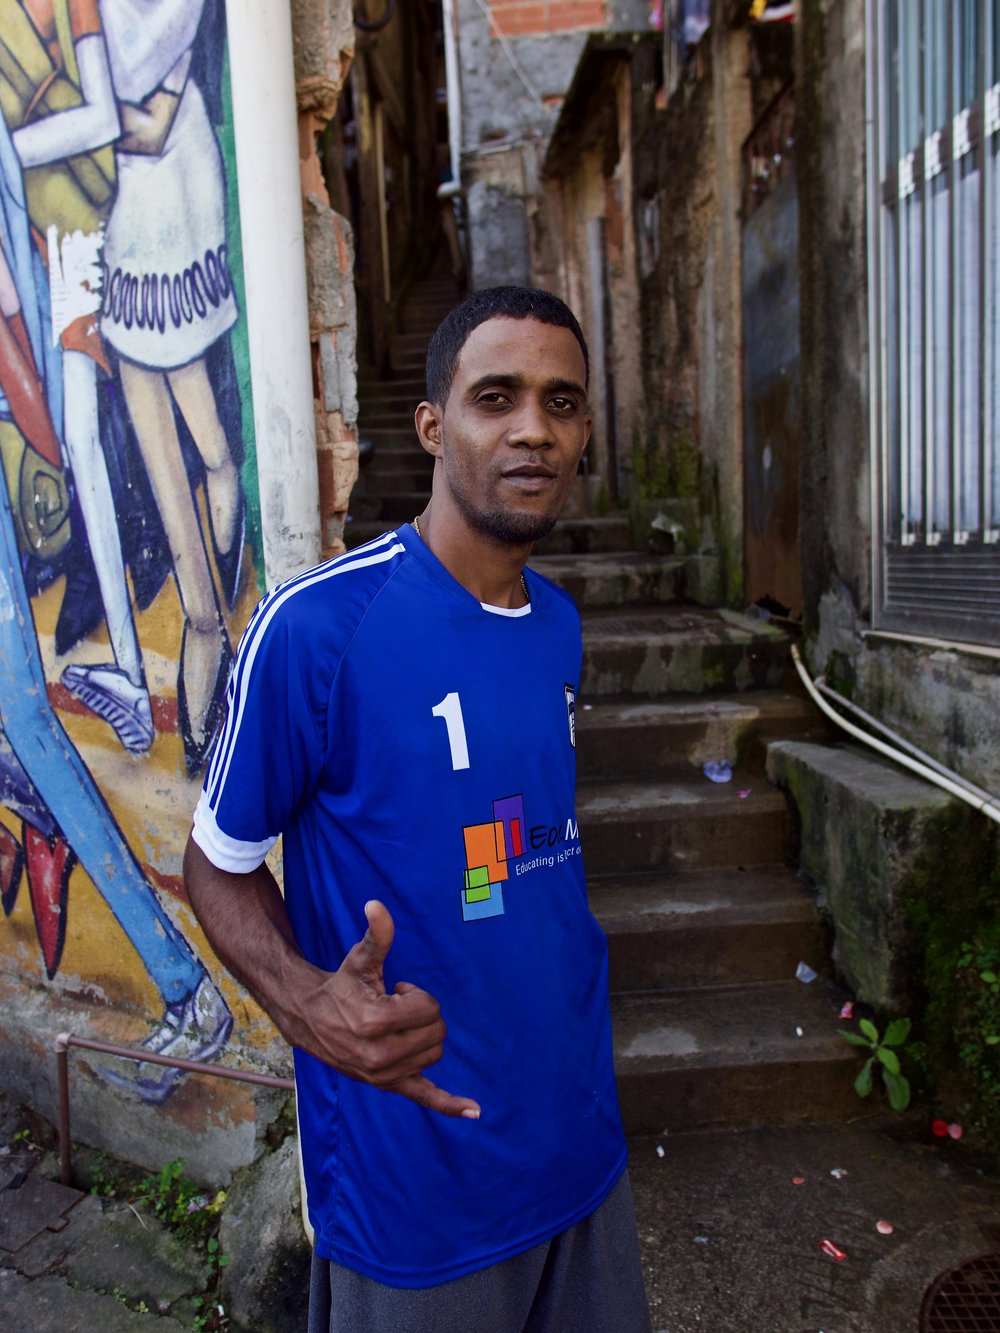 William Salles - Football Coach, Escolinha de FutebolTeaching children football in the Cantagalo Favela of Rio de Janeiro.Read his story here: